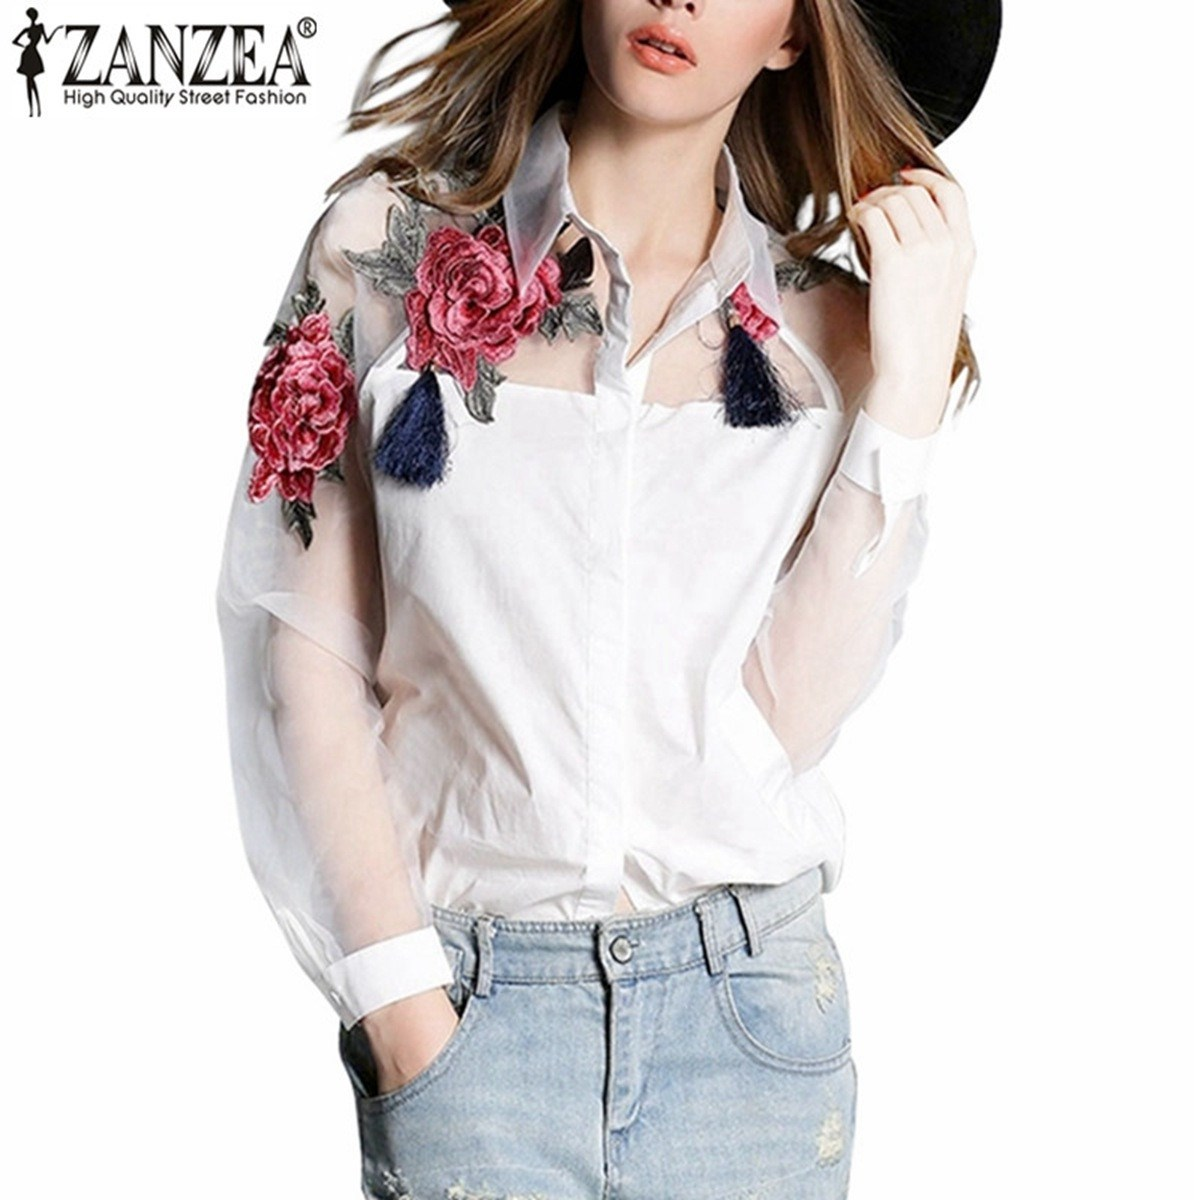 631ed5cdbc2 ZANZEA Women 2017 Autumn Blusas Vintage Long Sleeve Embroidery Floral Print  Blouses Tops Ladies Elegant Lapel Organza Shirts